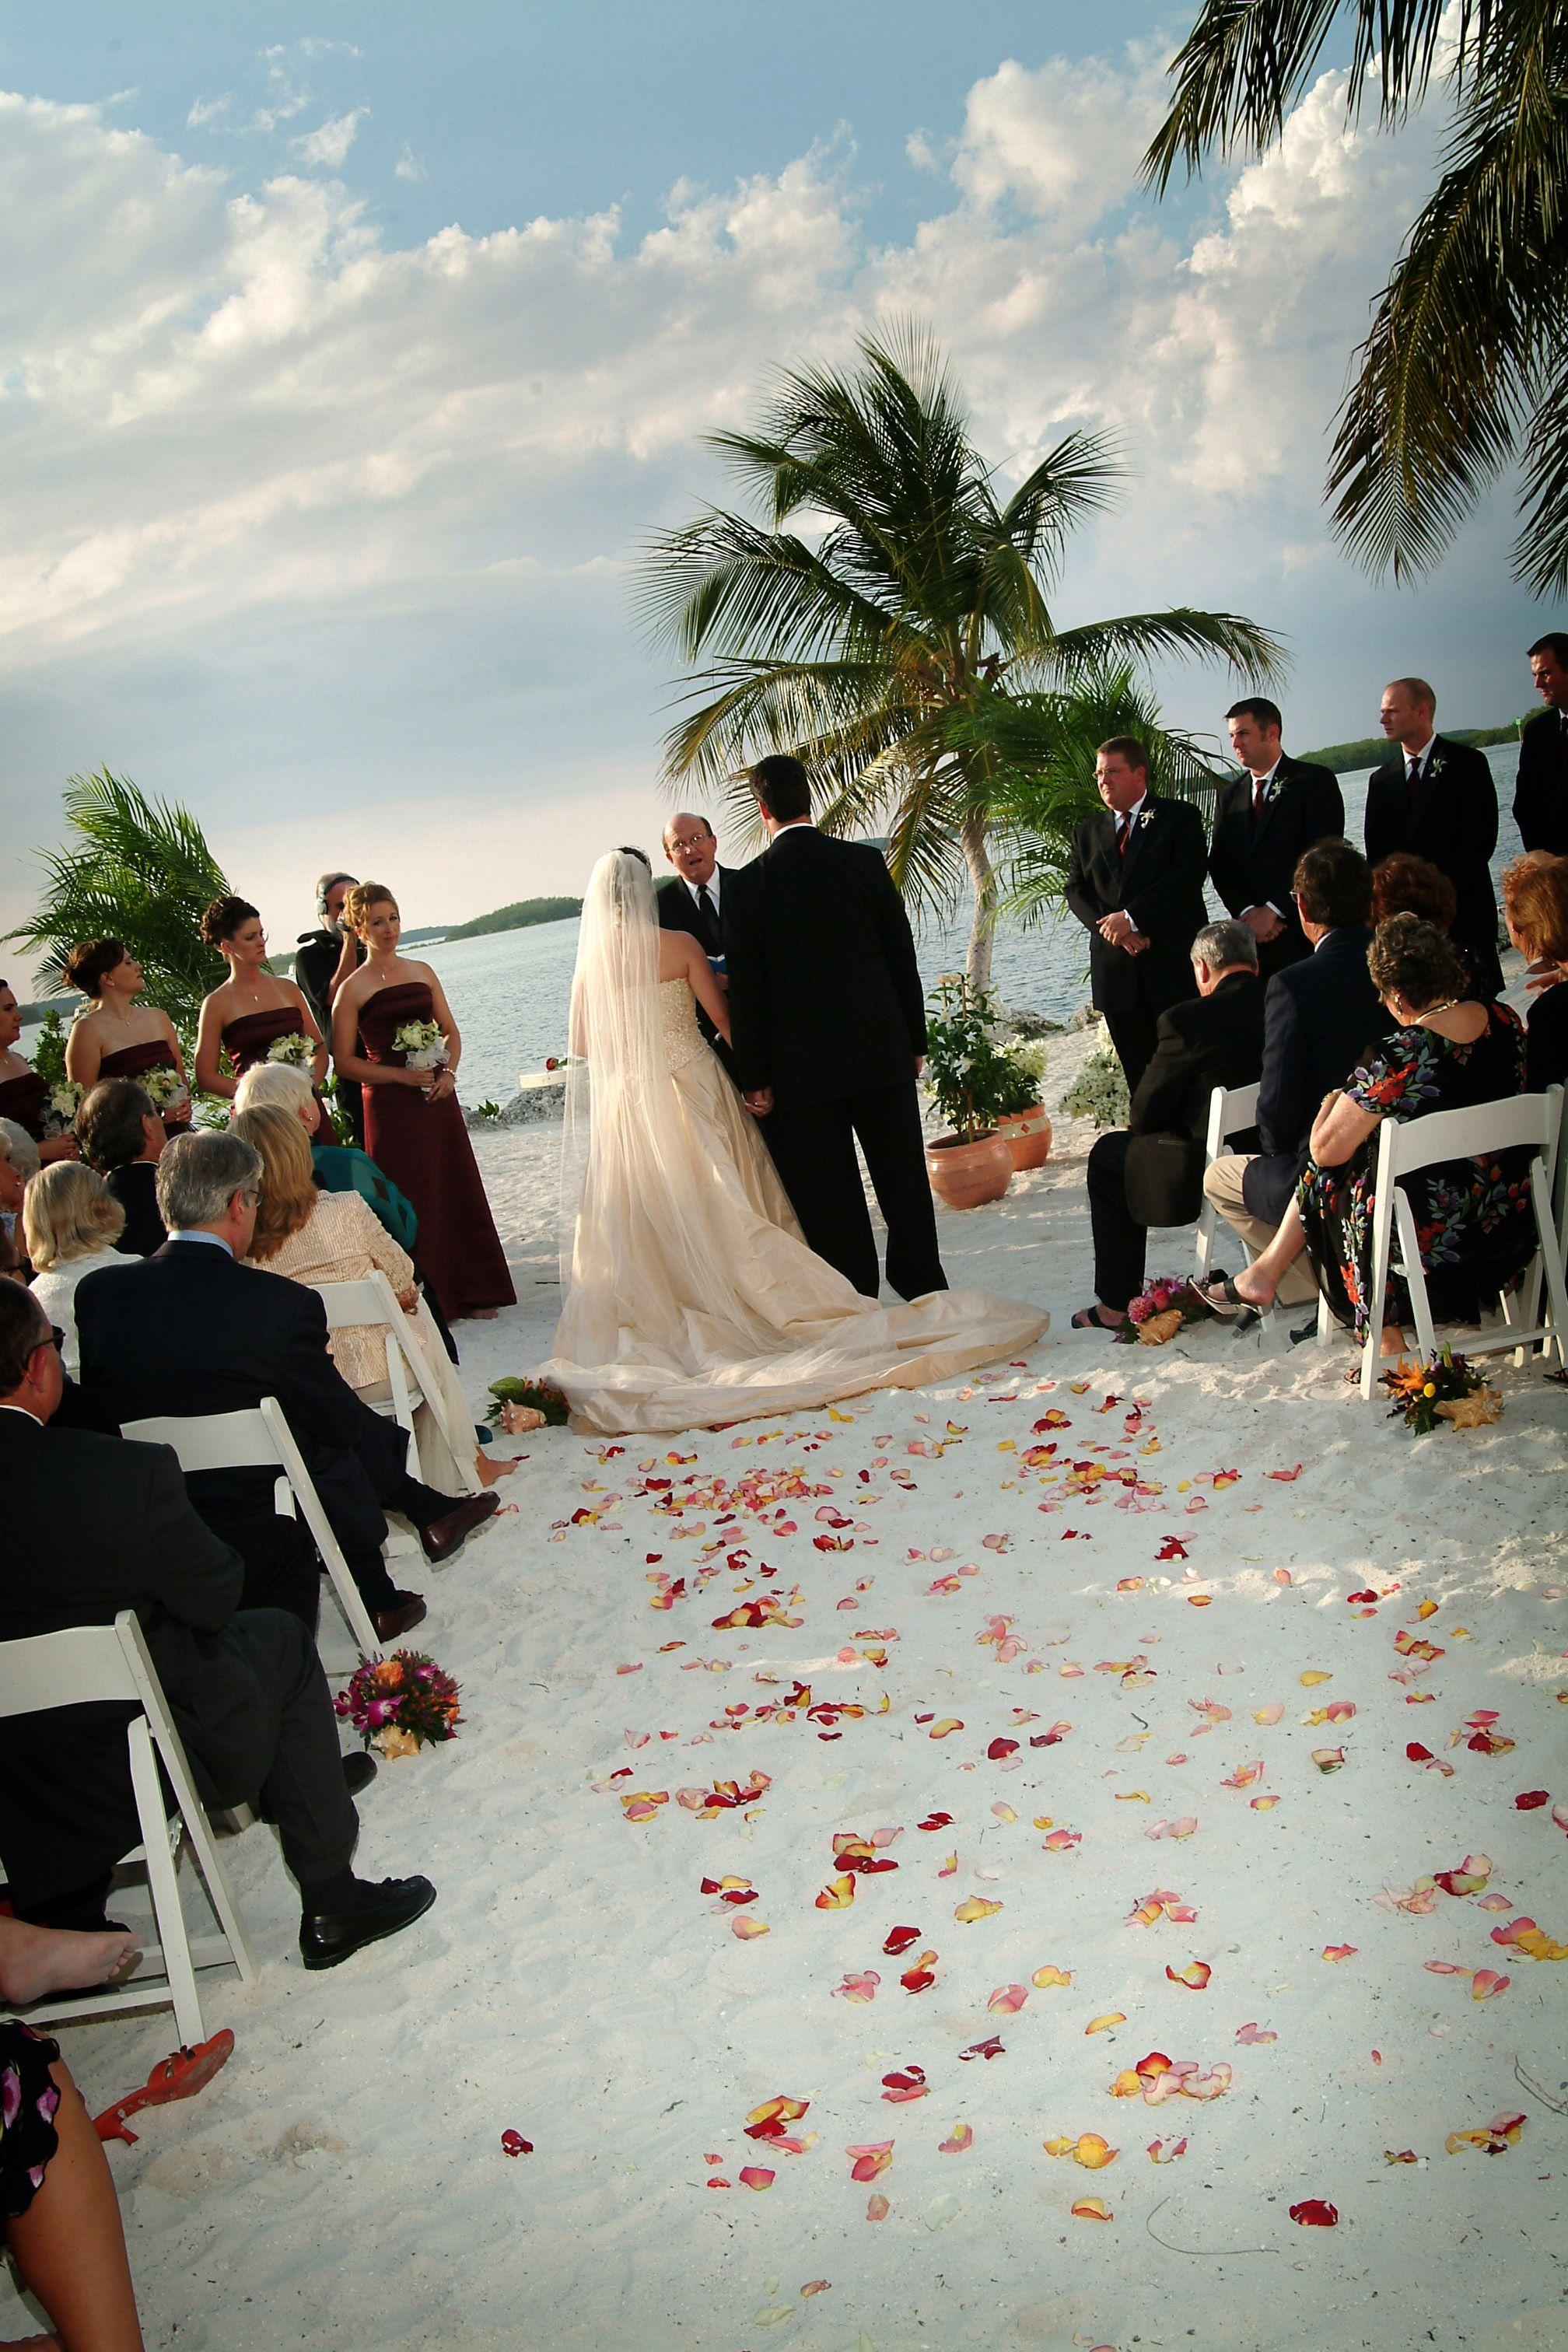 Weddings Thomas Maddi Photography Tee Wedding Photographer St George Island